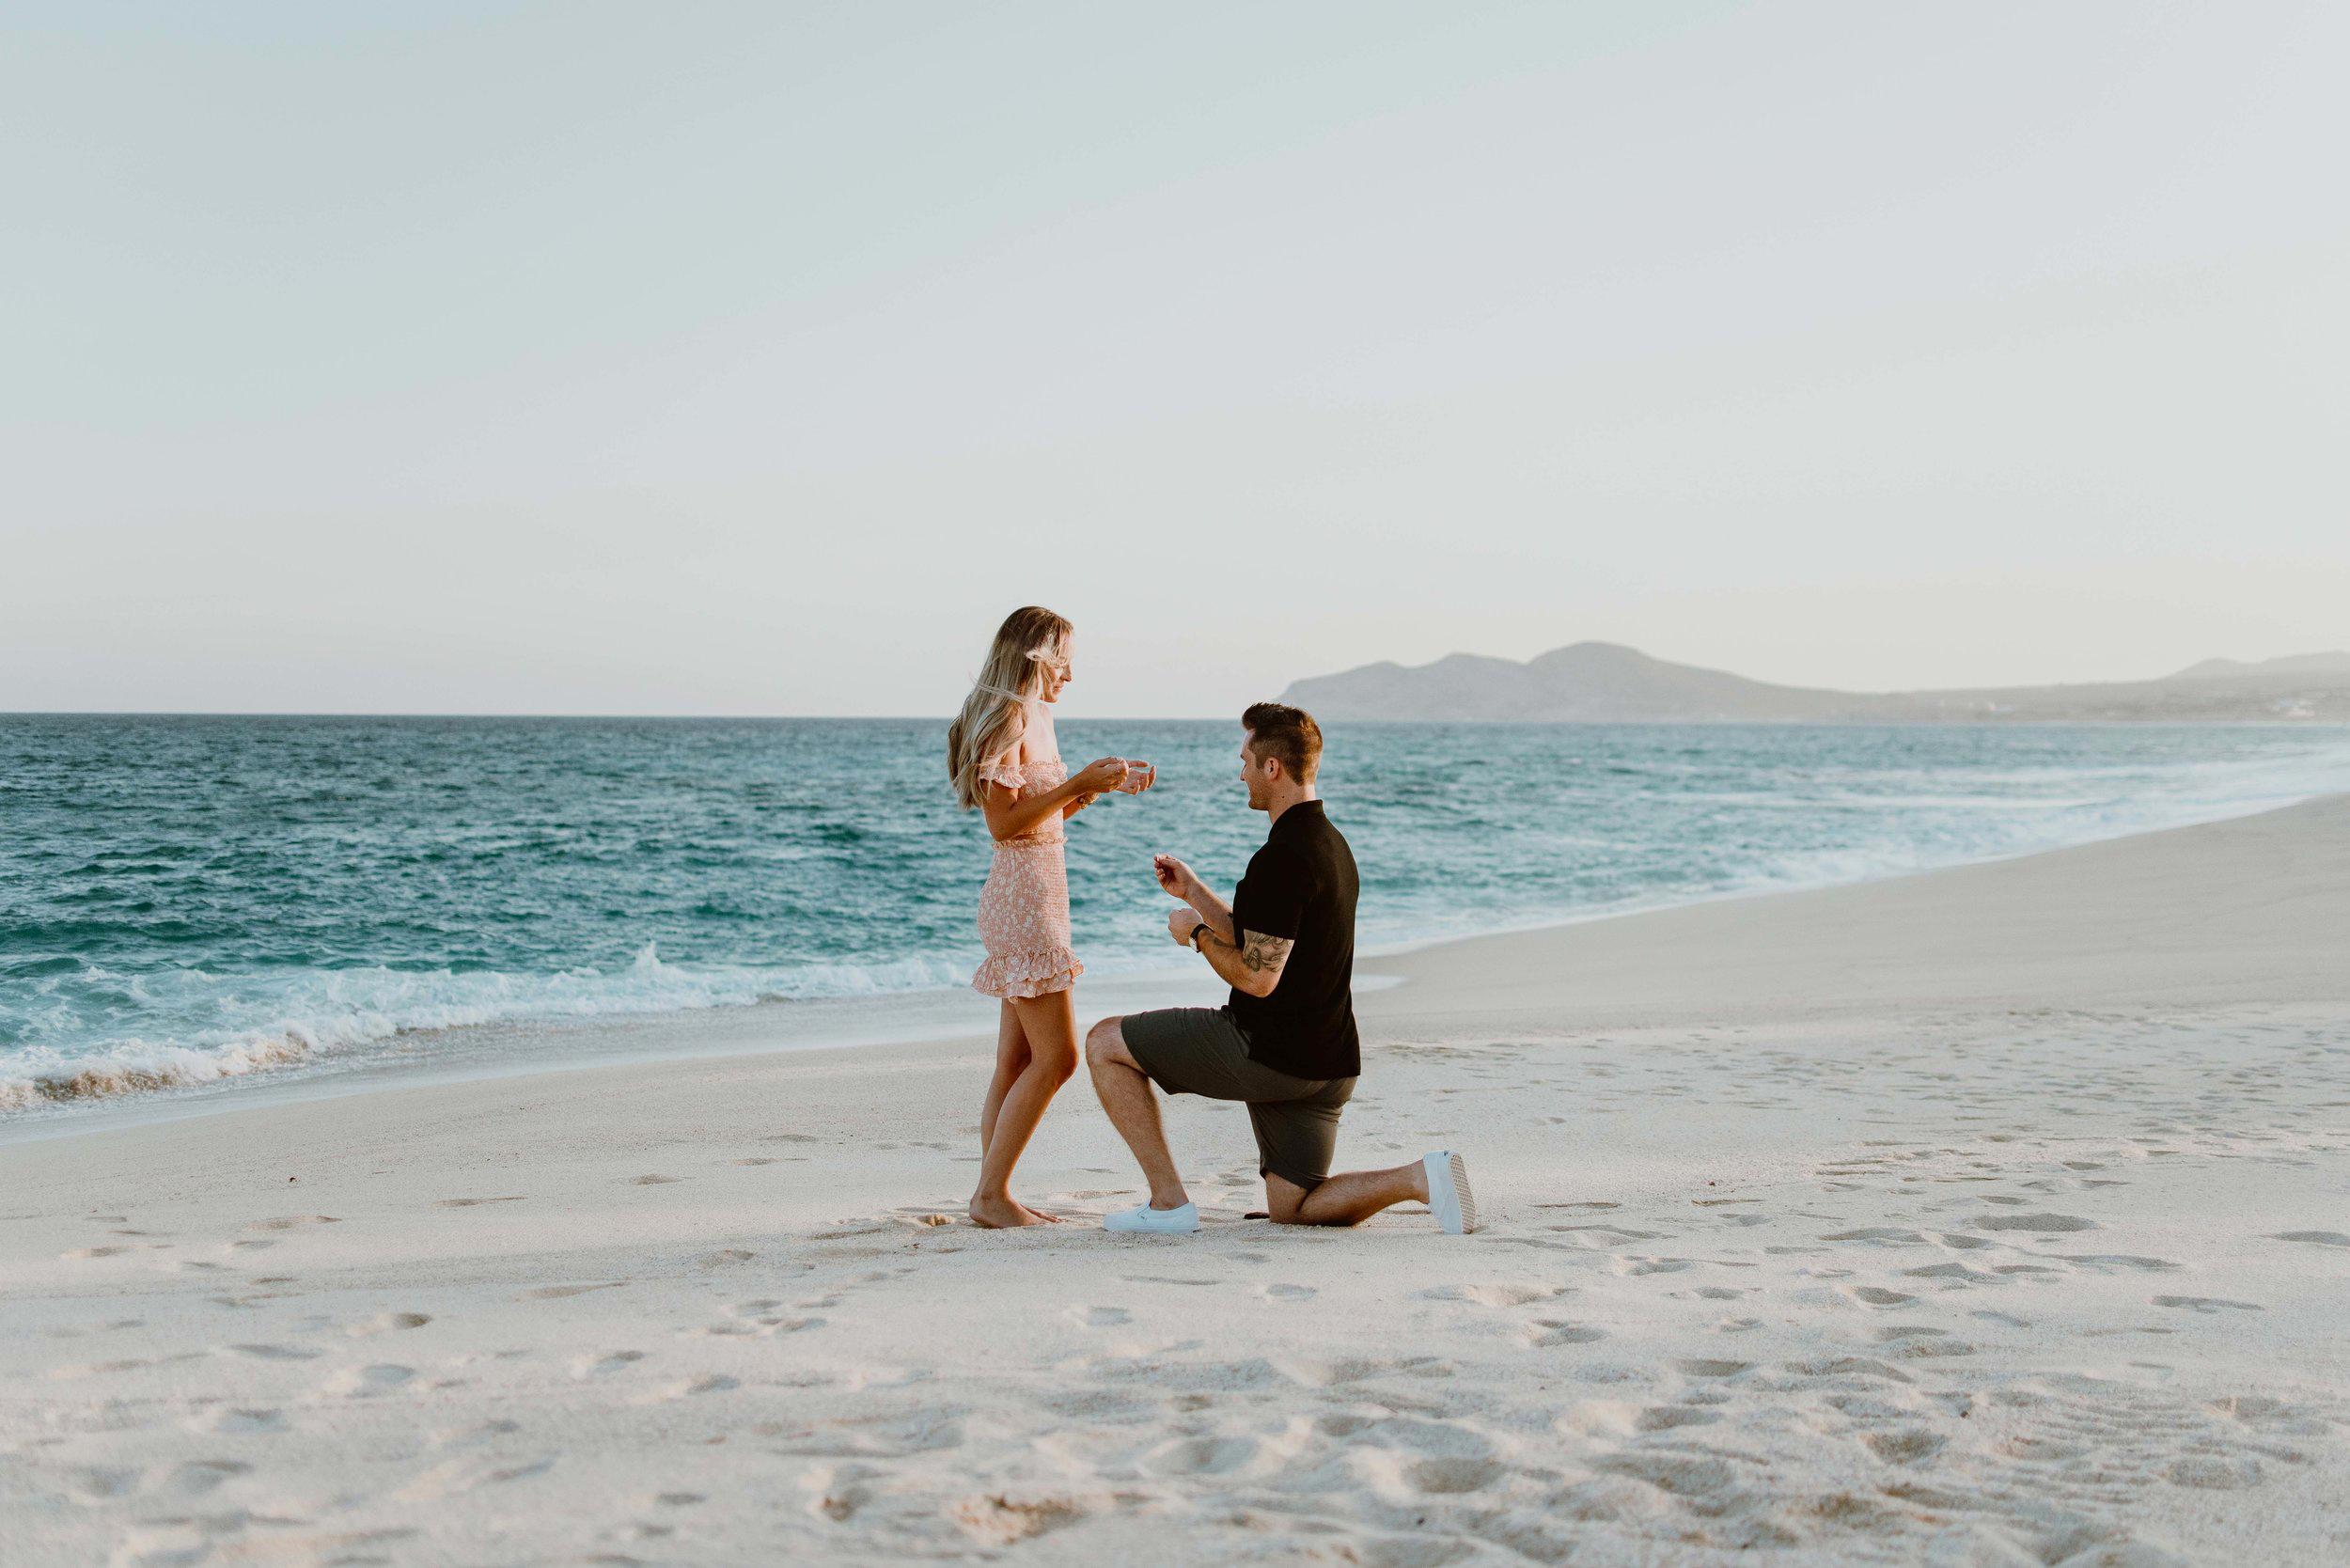 Morganne+Jarad+Engagement-5.jpg